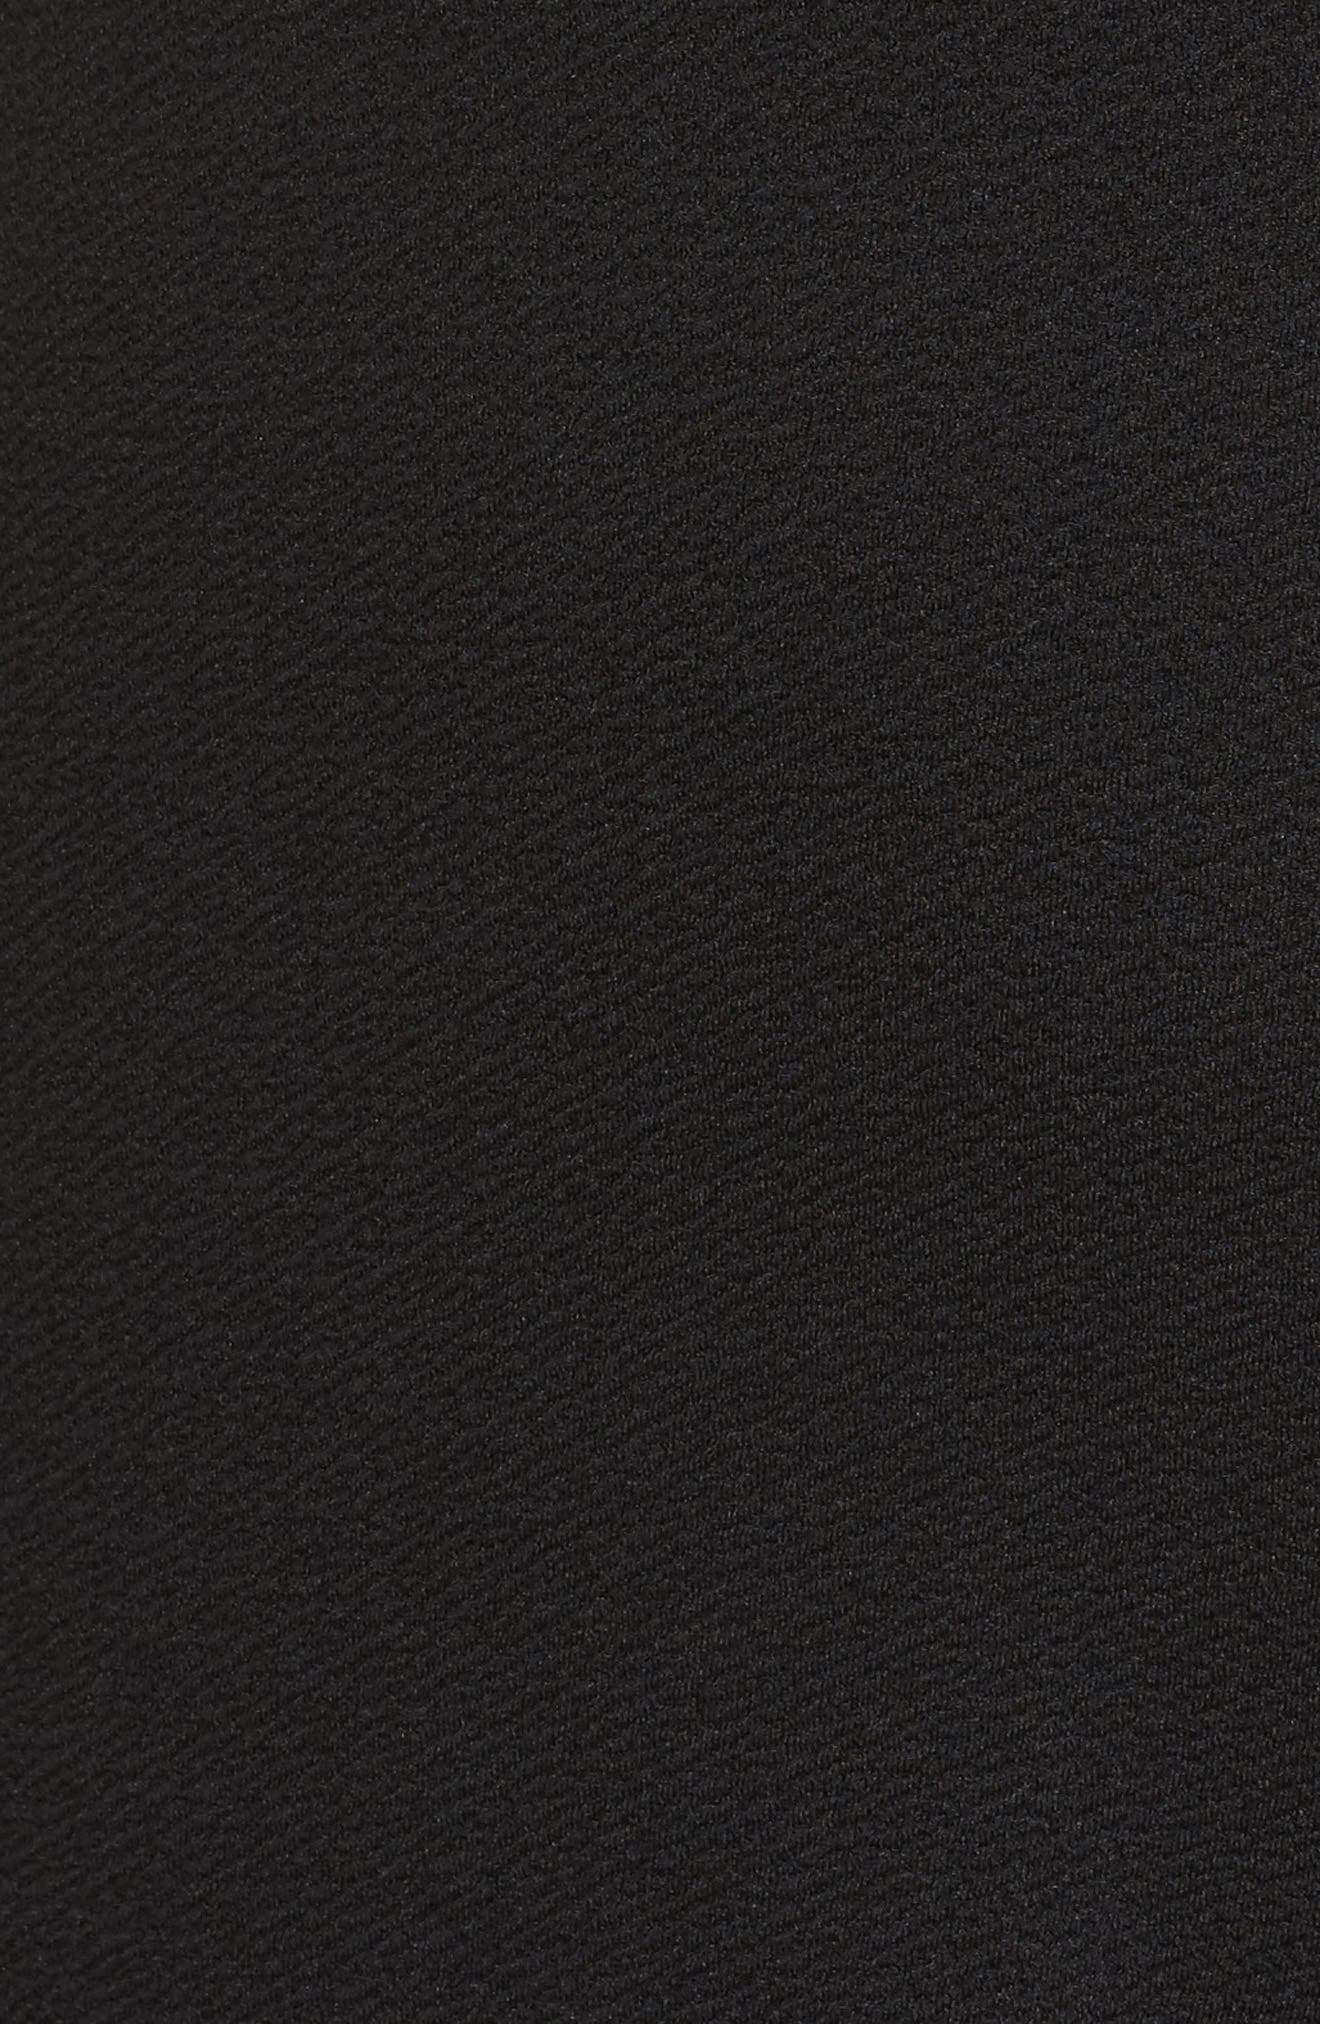 Ruffle Sleeve Romper,                             Alternate thumbnail 5, color,                             Black